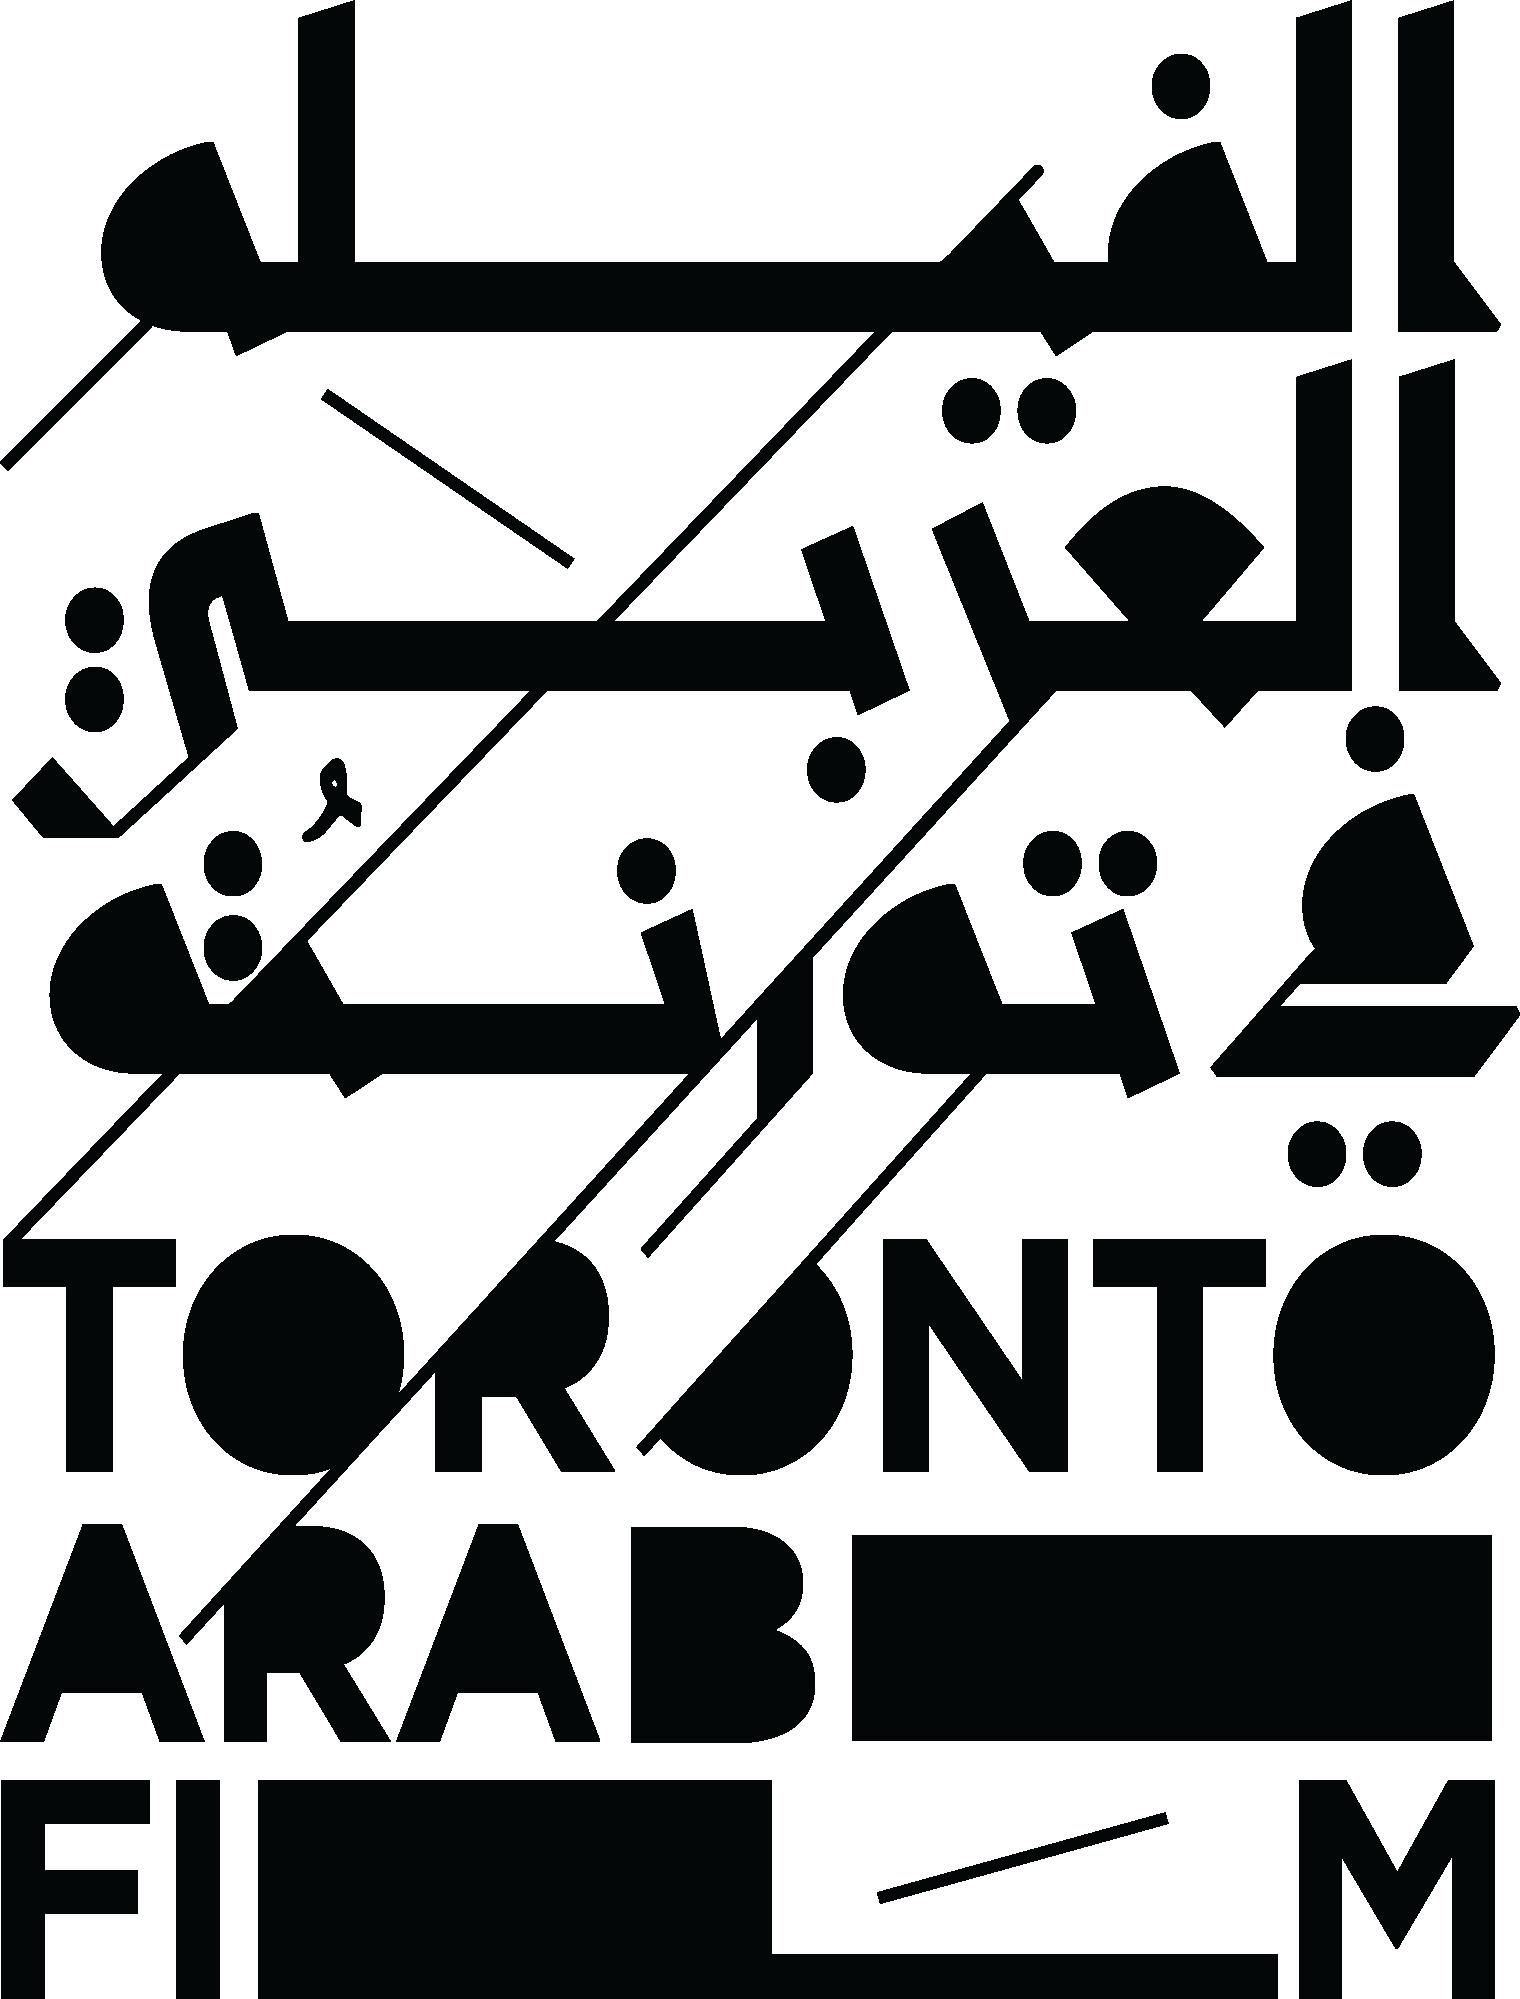 Toronto Arab Film Festival